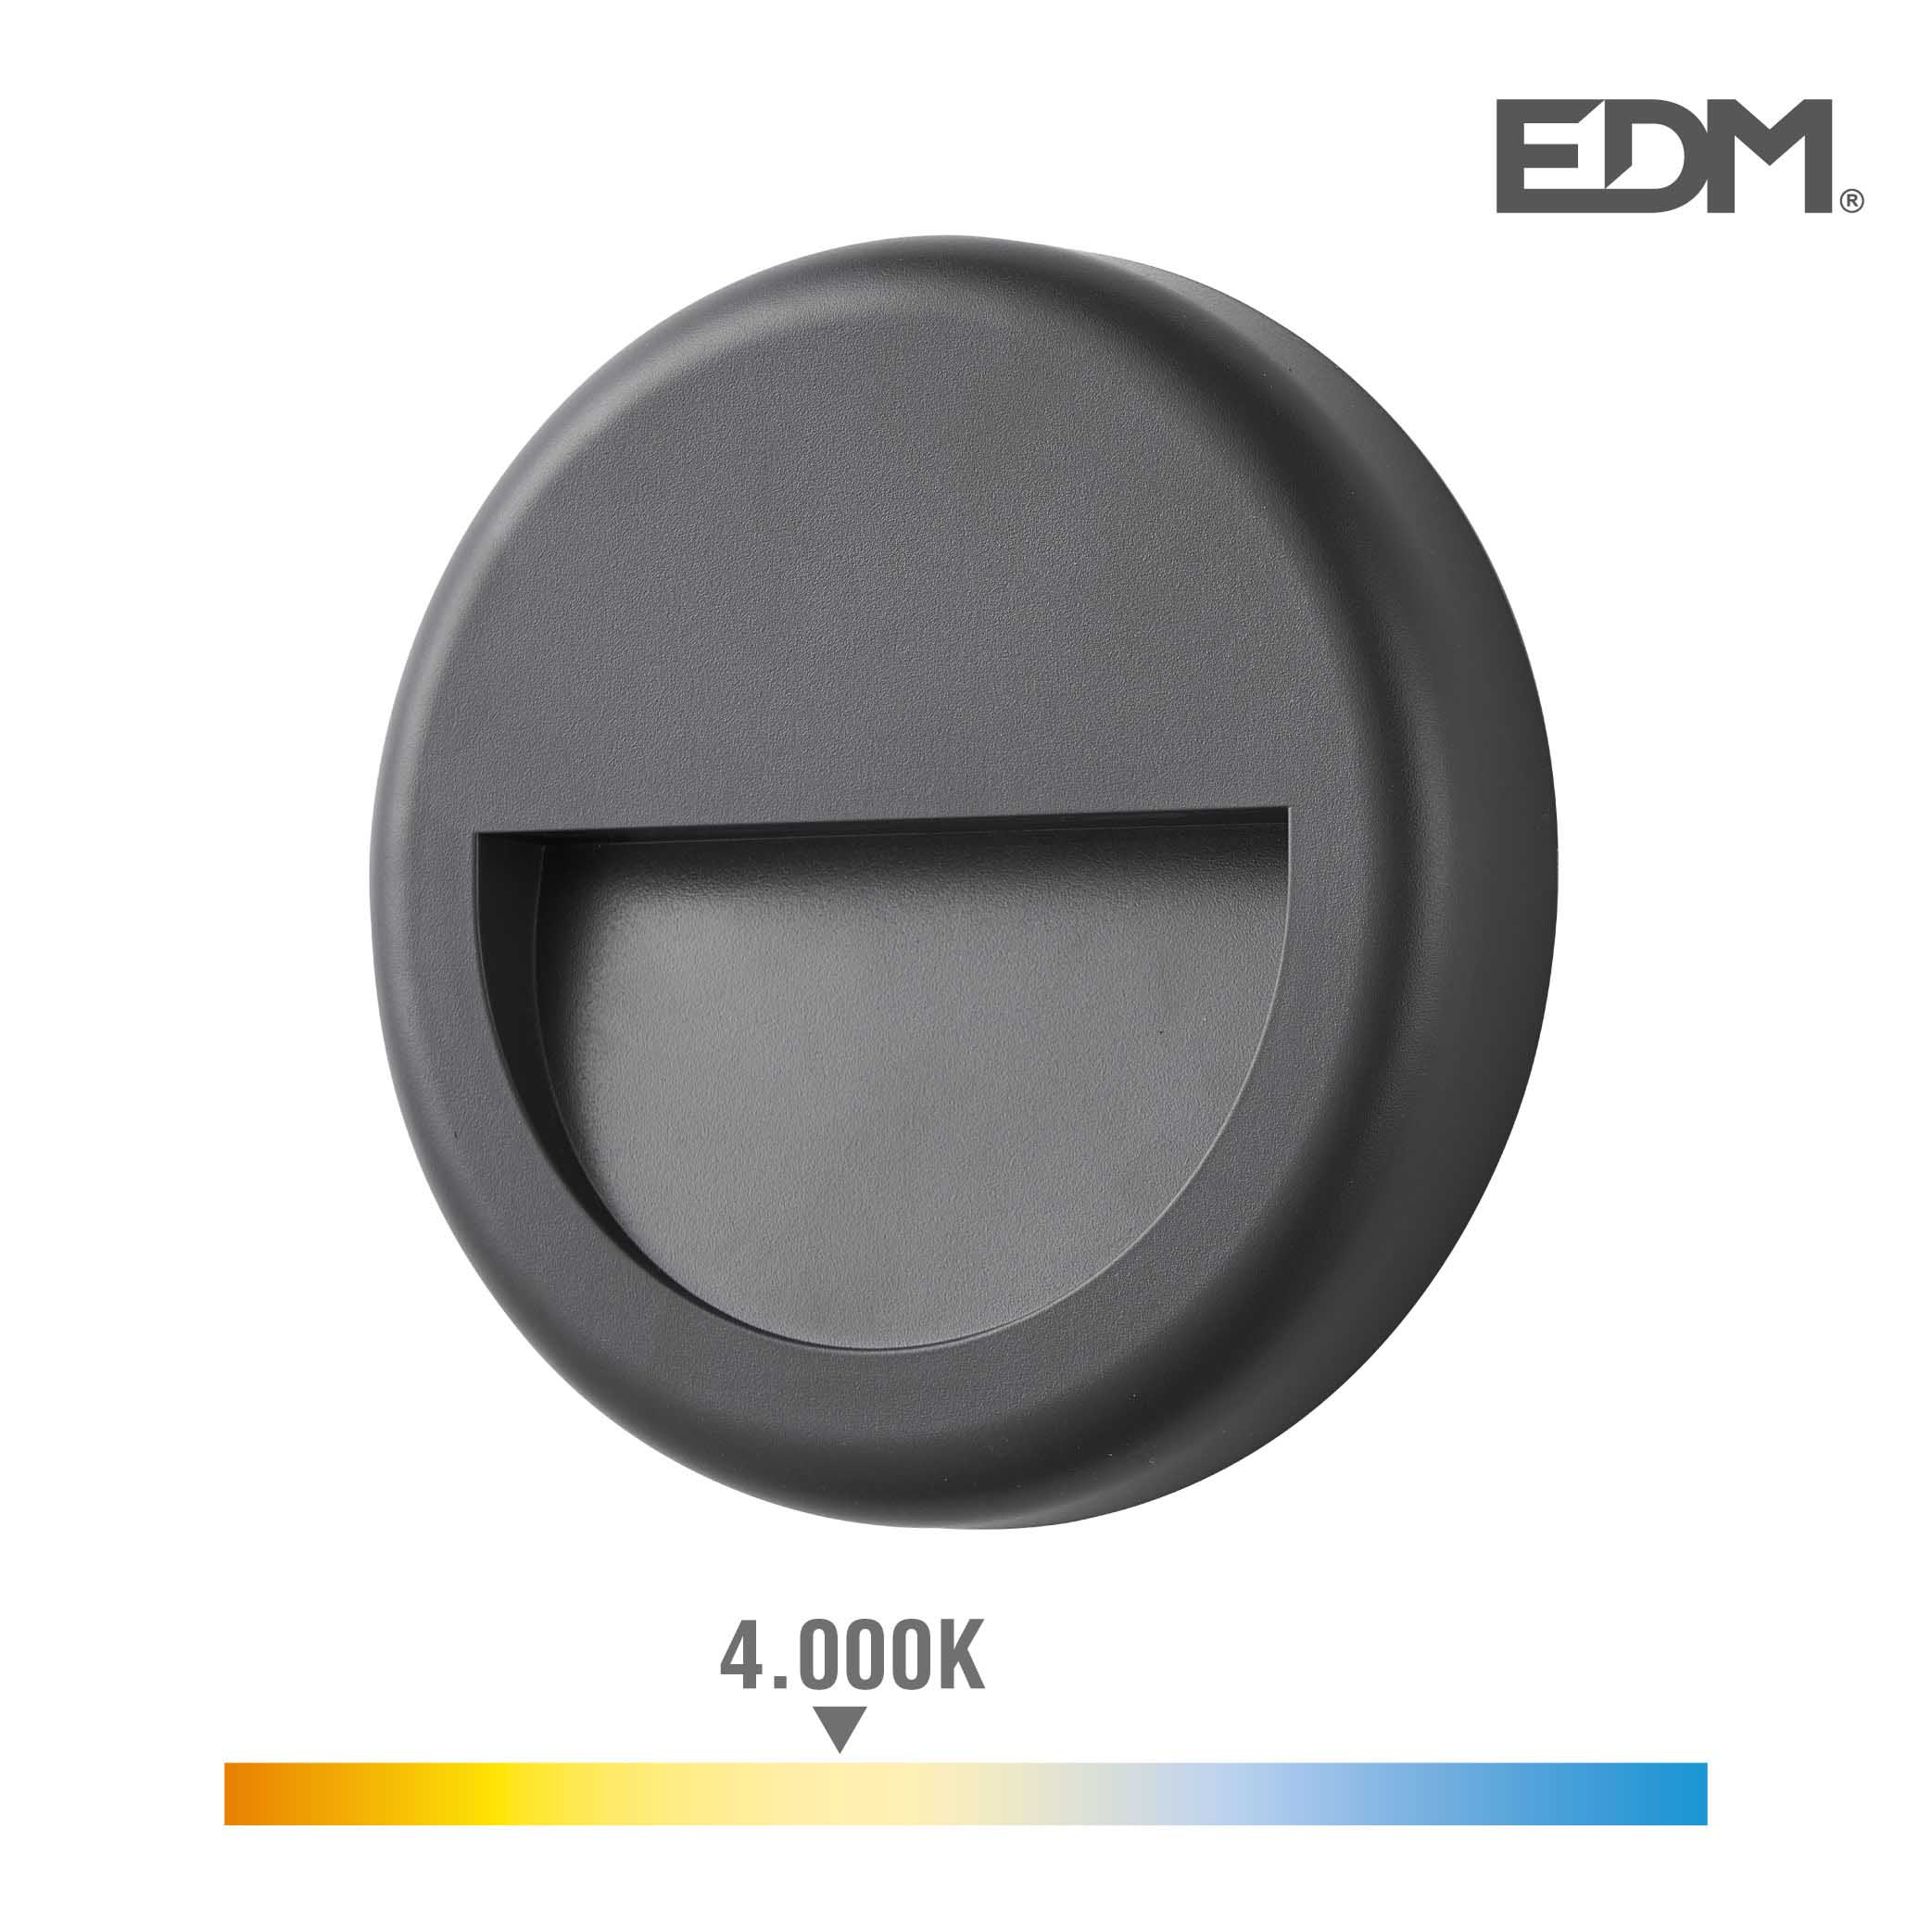 Aplique led 6w 70 lumen 4.000k luz dia ip65 redondo edm